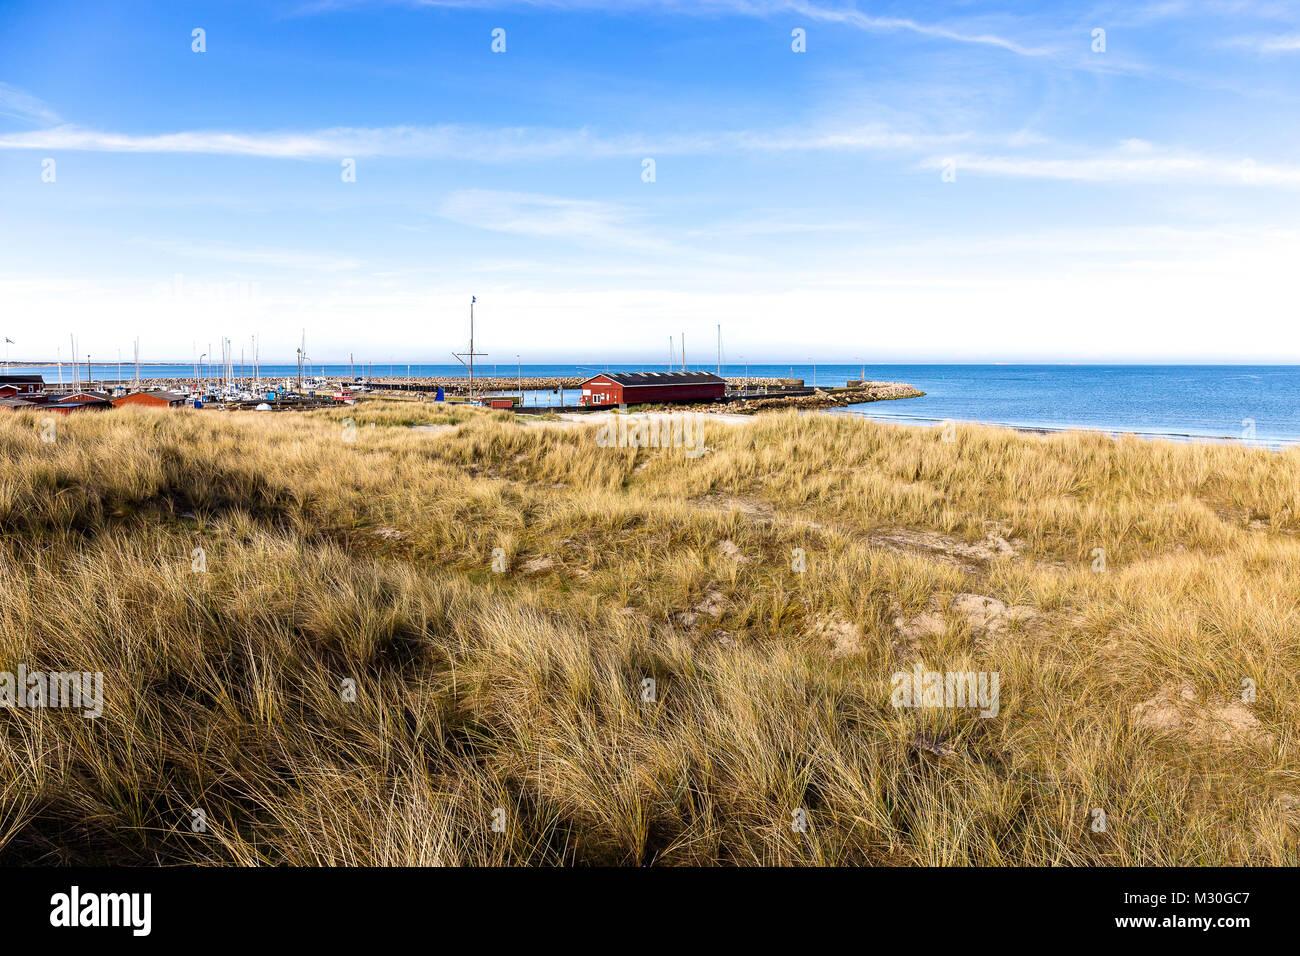 Beach at the little village Aalbæk near Skagen in the area of Kattegat - Stock Image